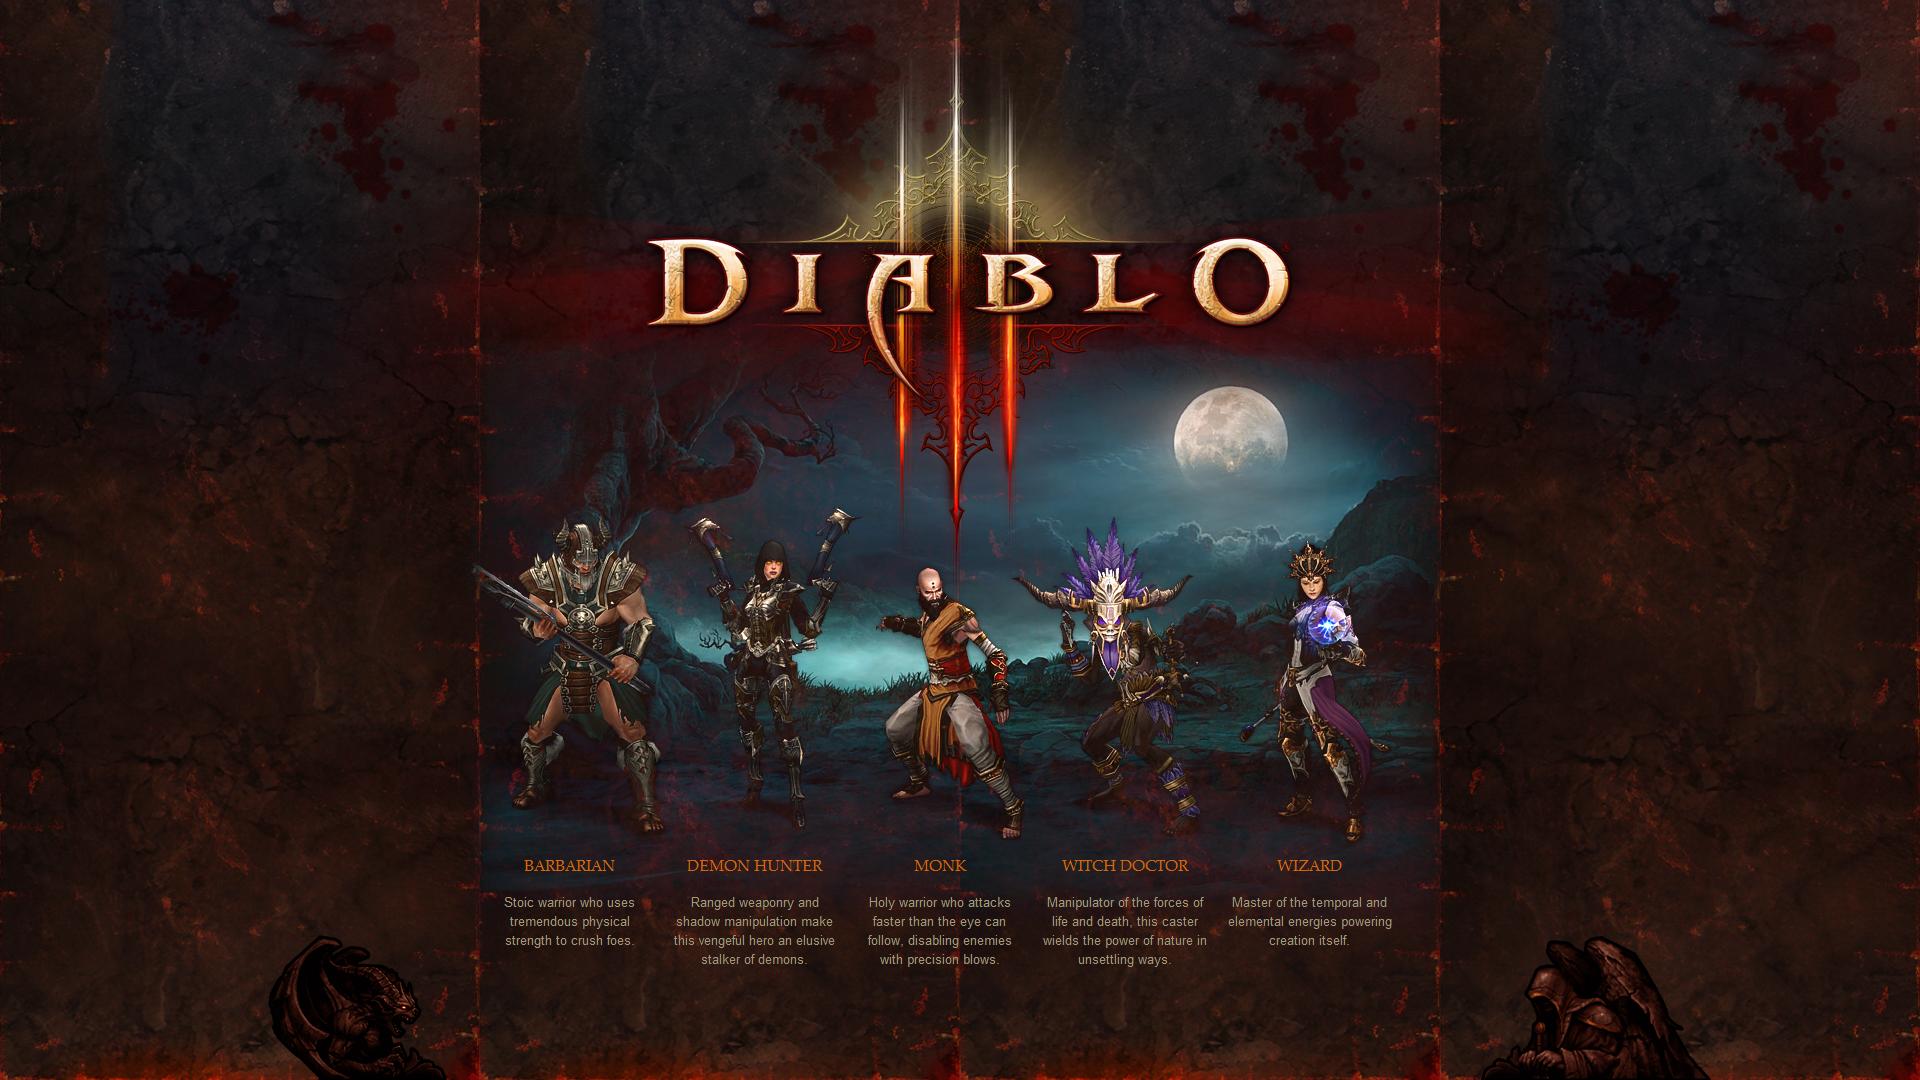 Diablo 3 Wallpaper 1920x1080: Diablo 3 Wizard Wallpaper